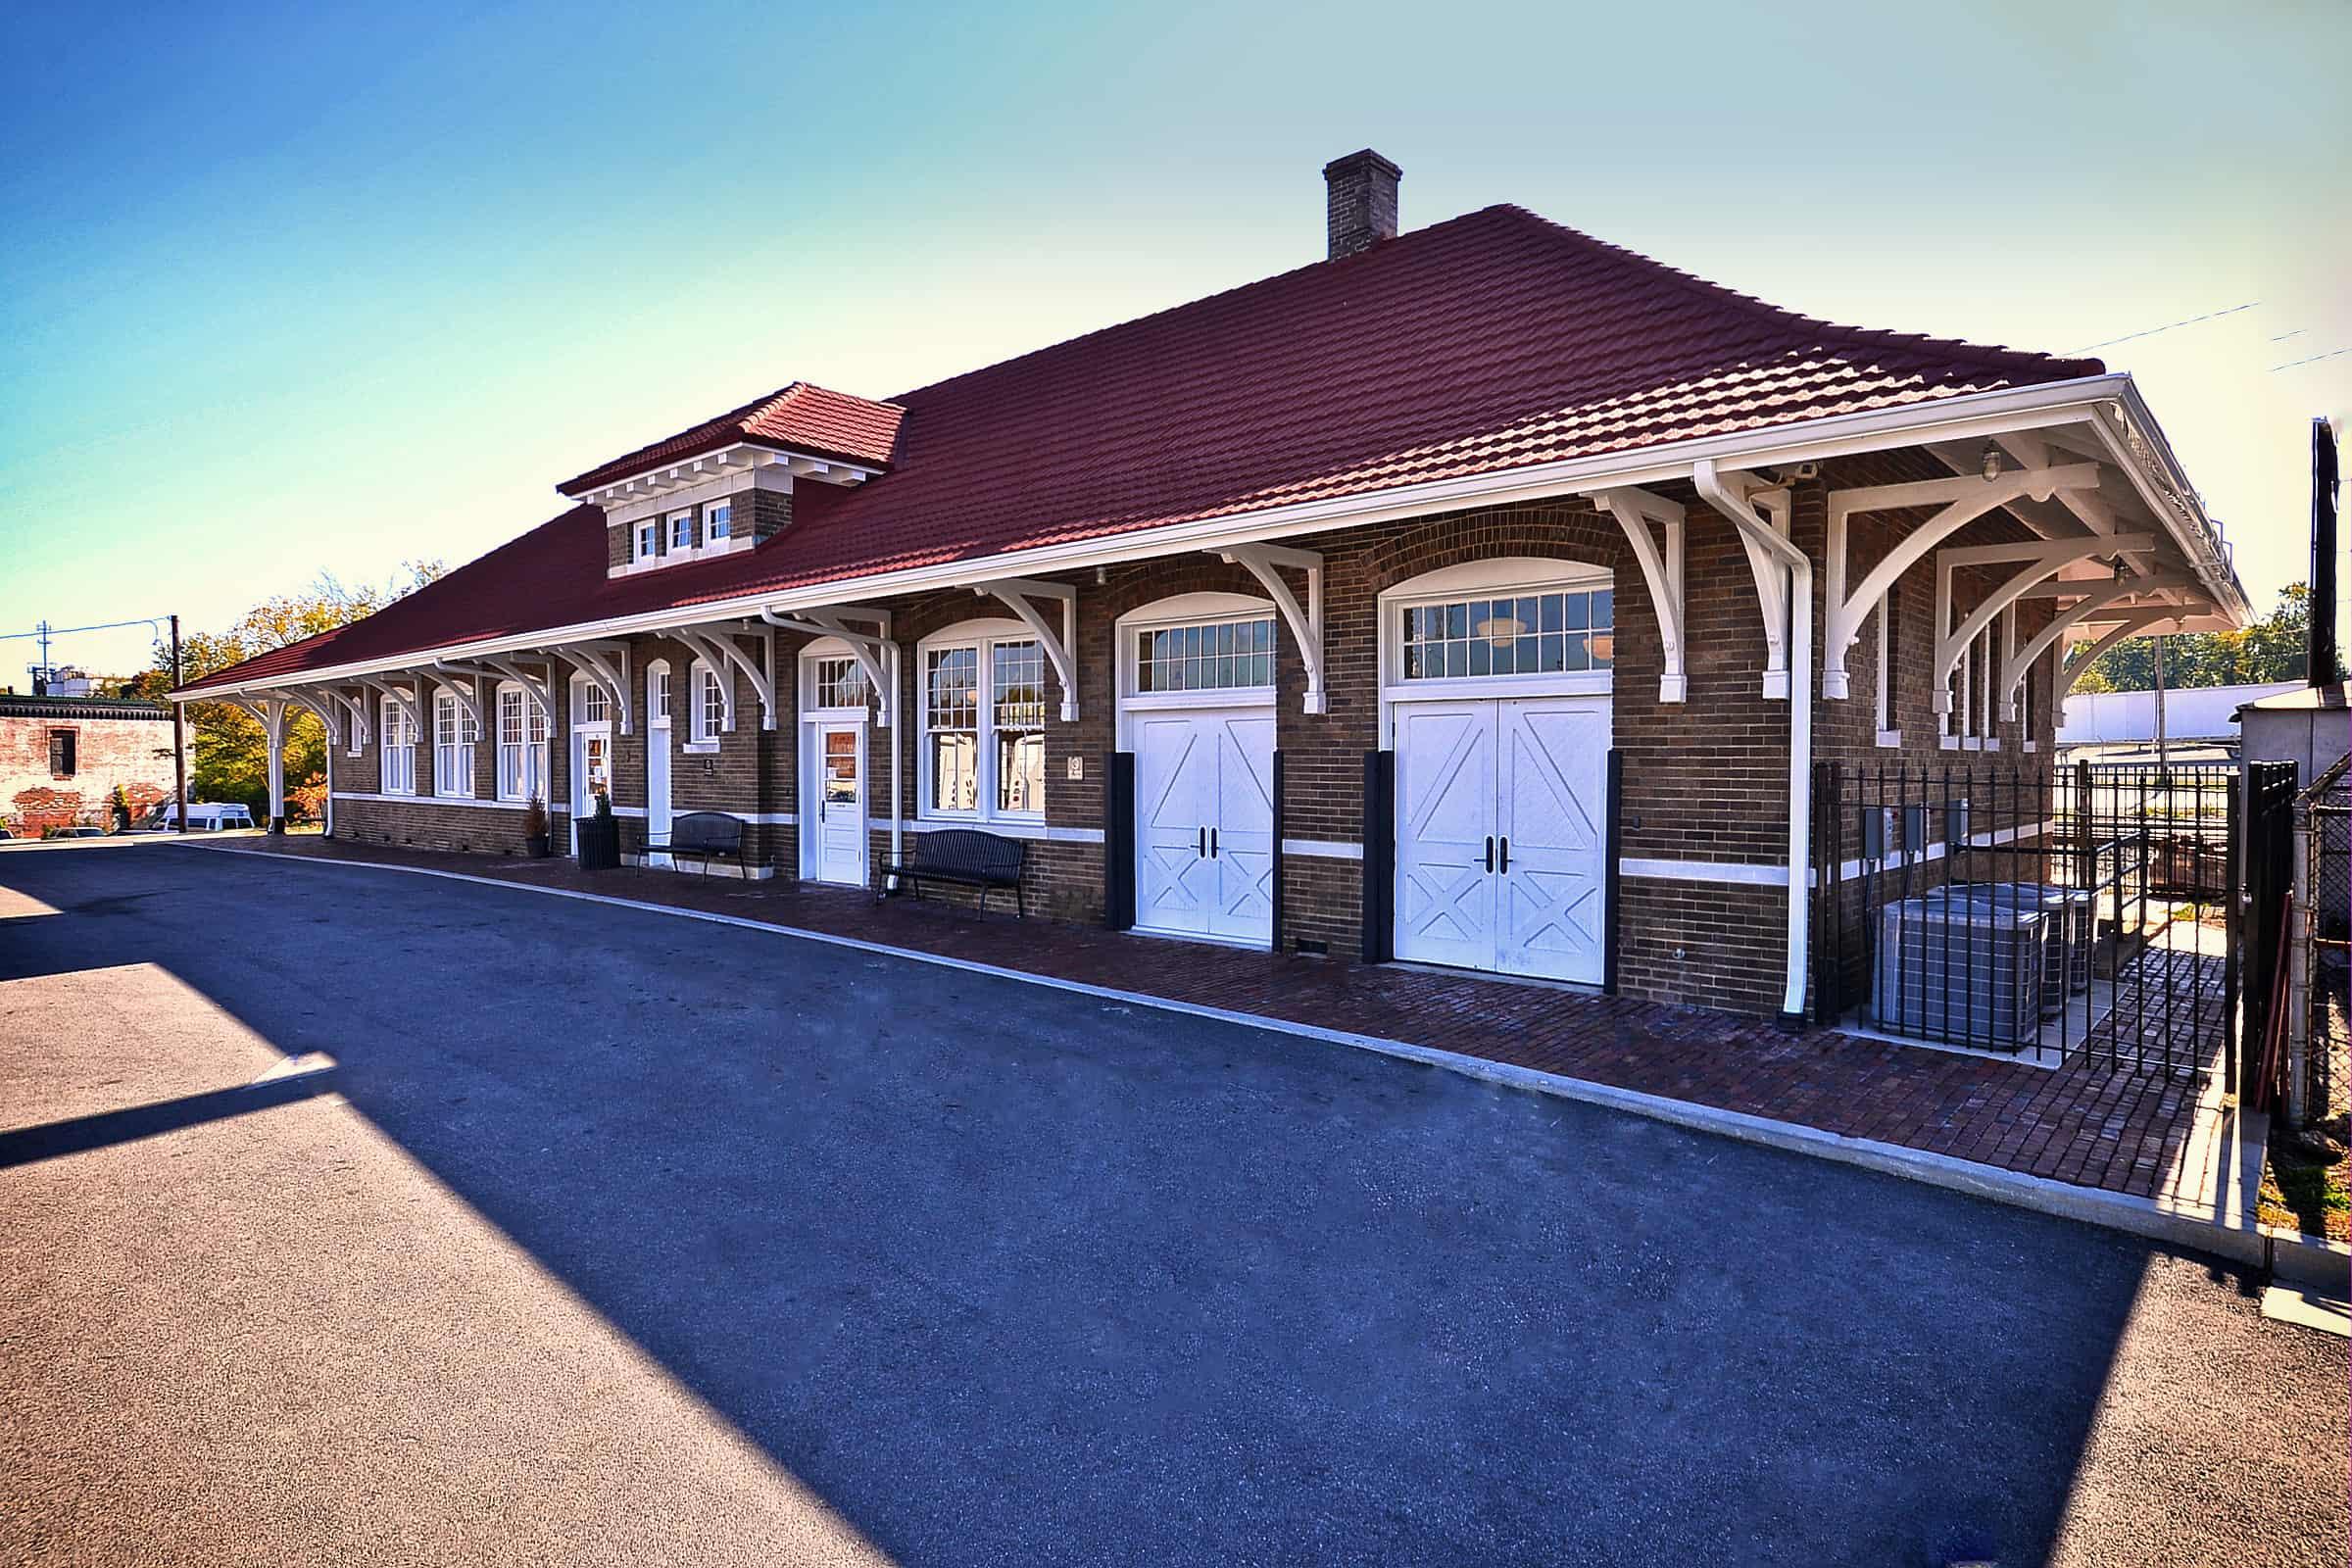 Cleveland Southern Railway Depot